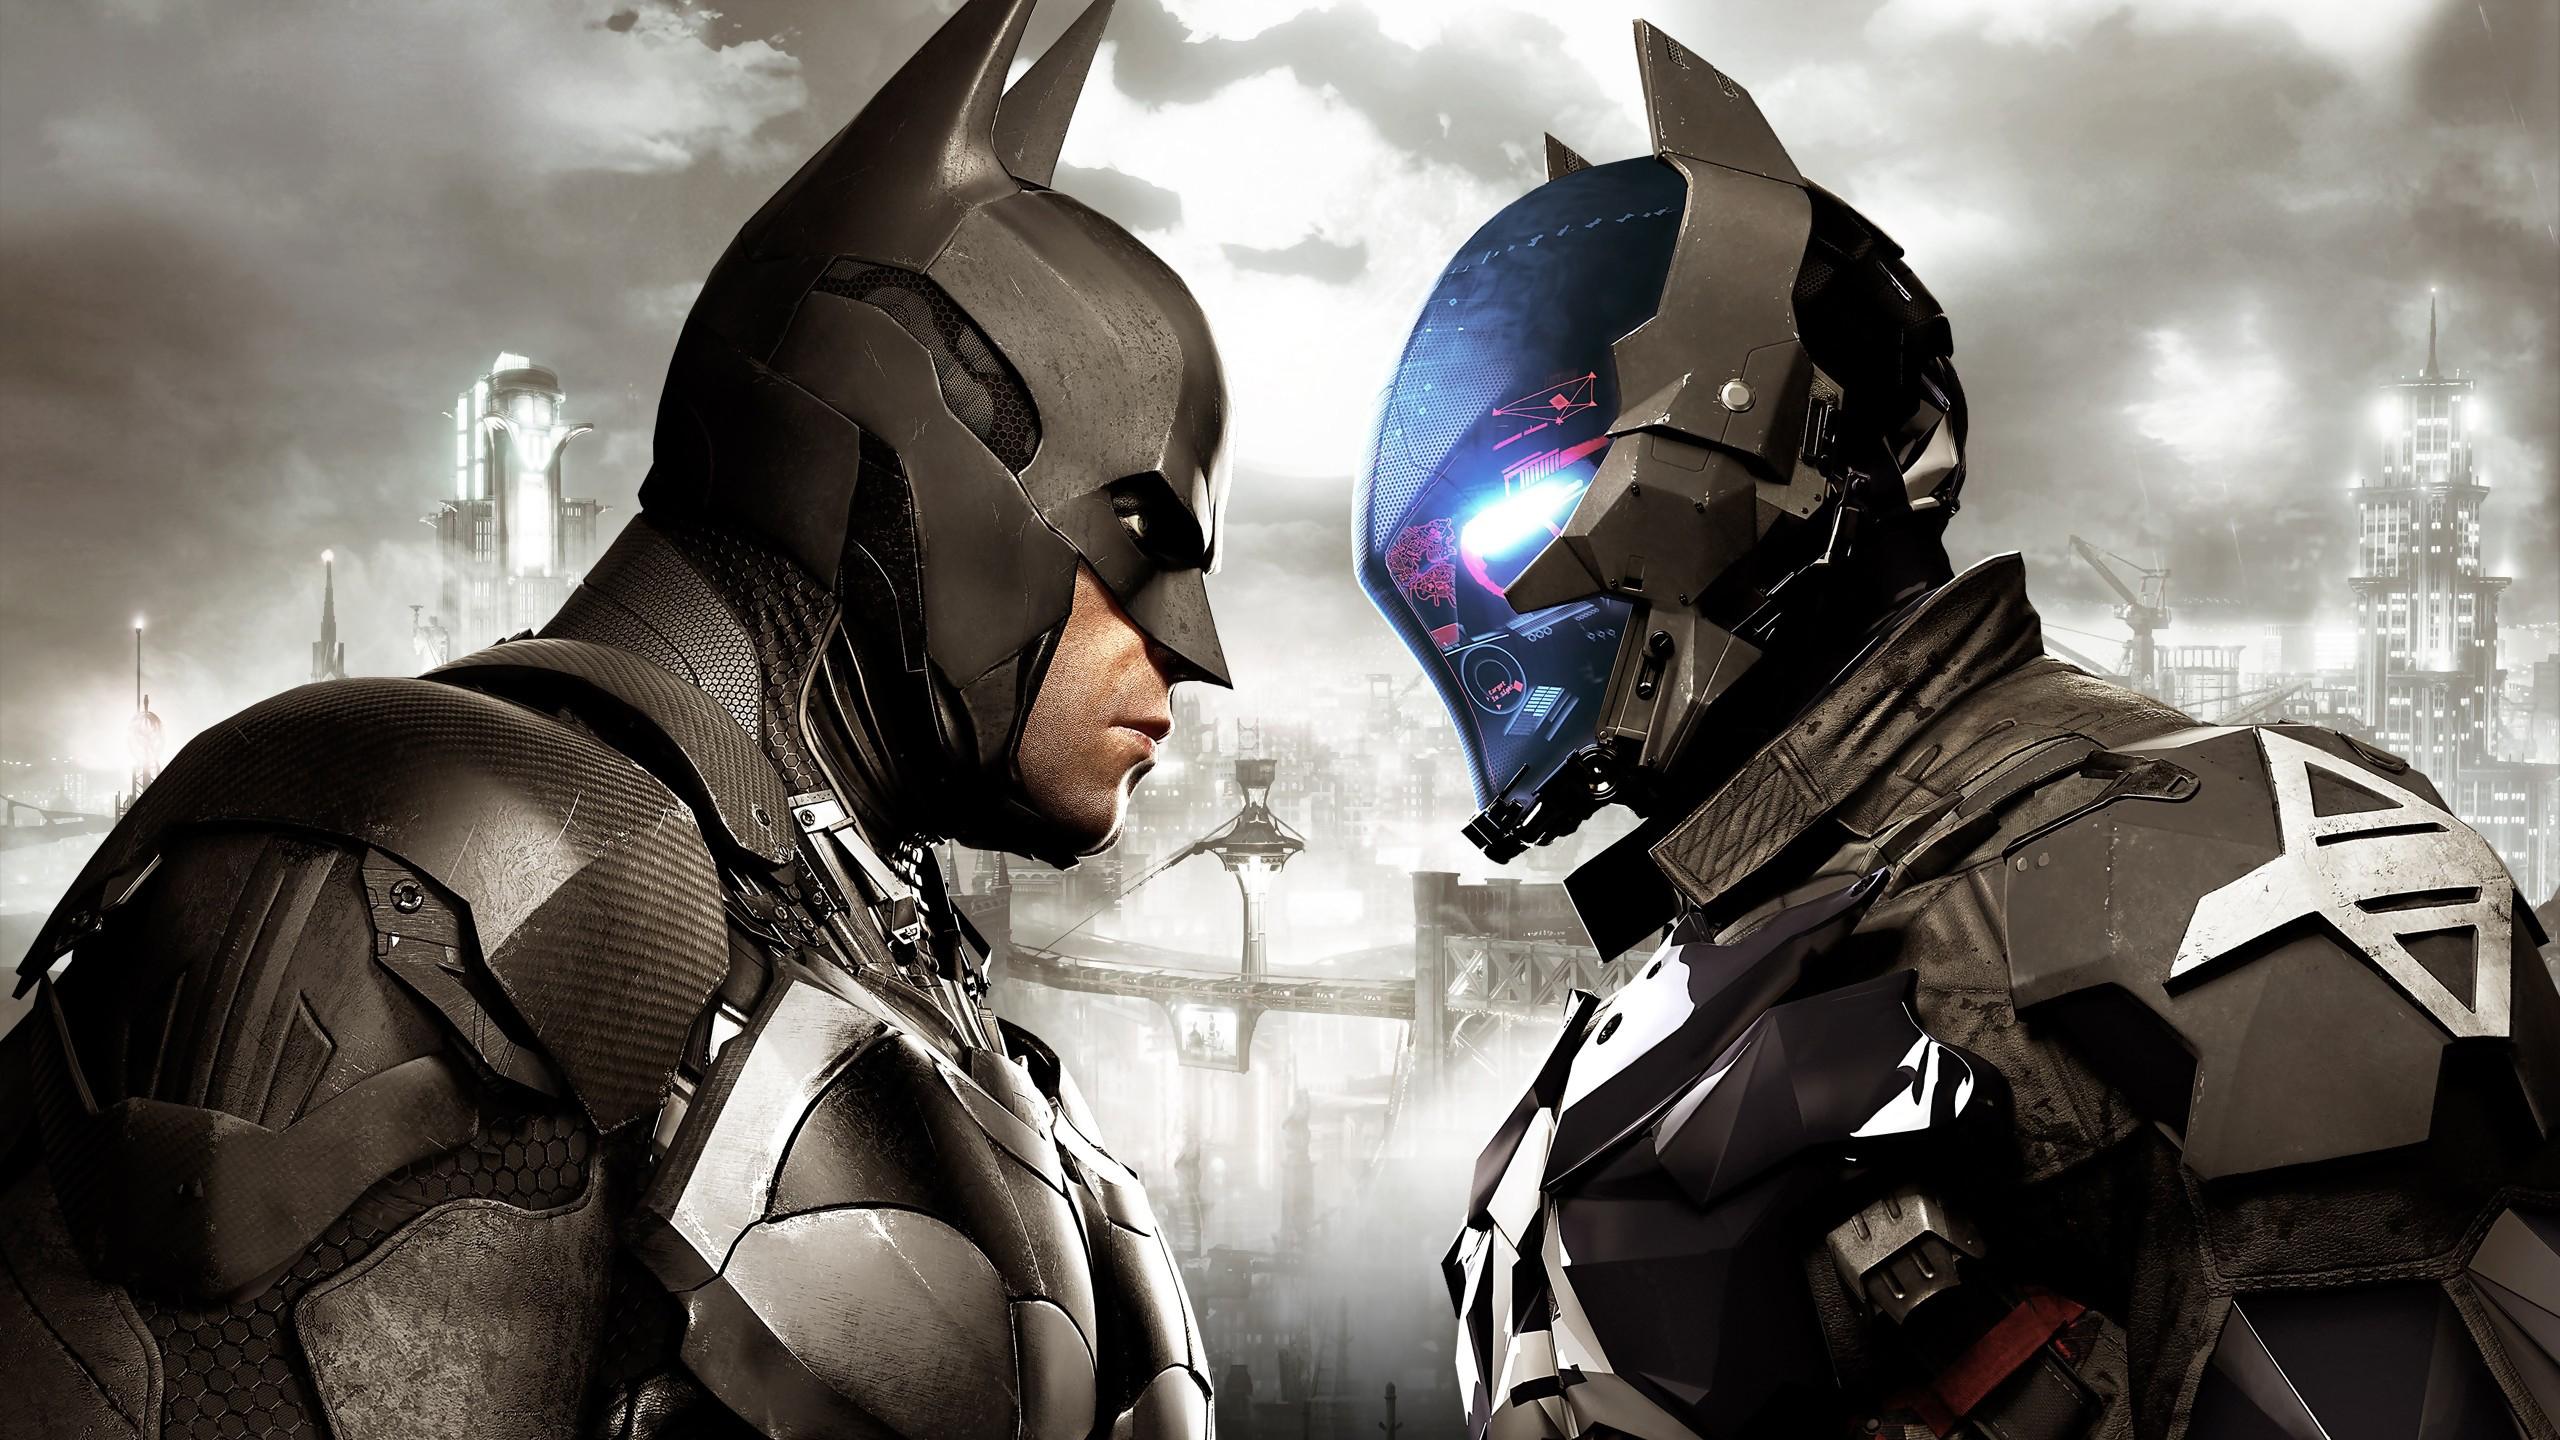 Batman Arkham Knight 2015 Wallpapers HD Wallpapers 2560x1440